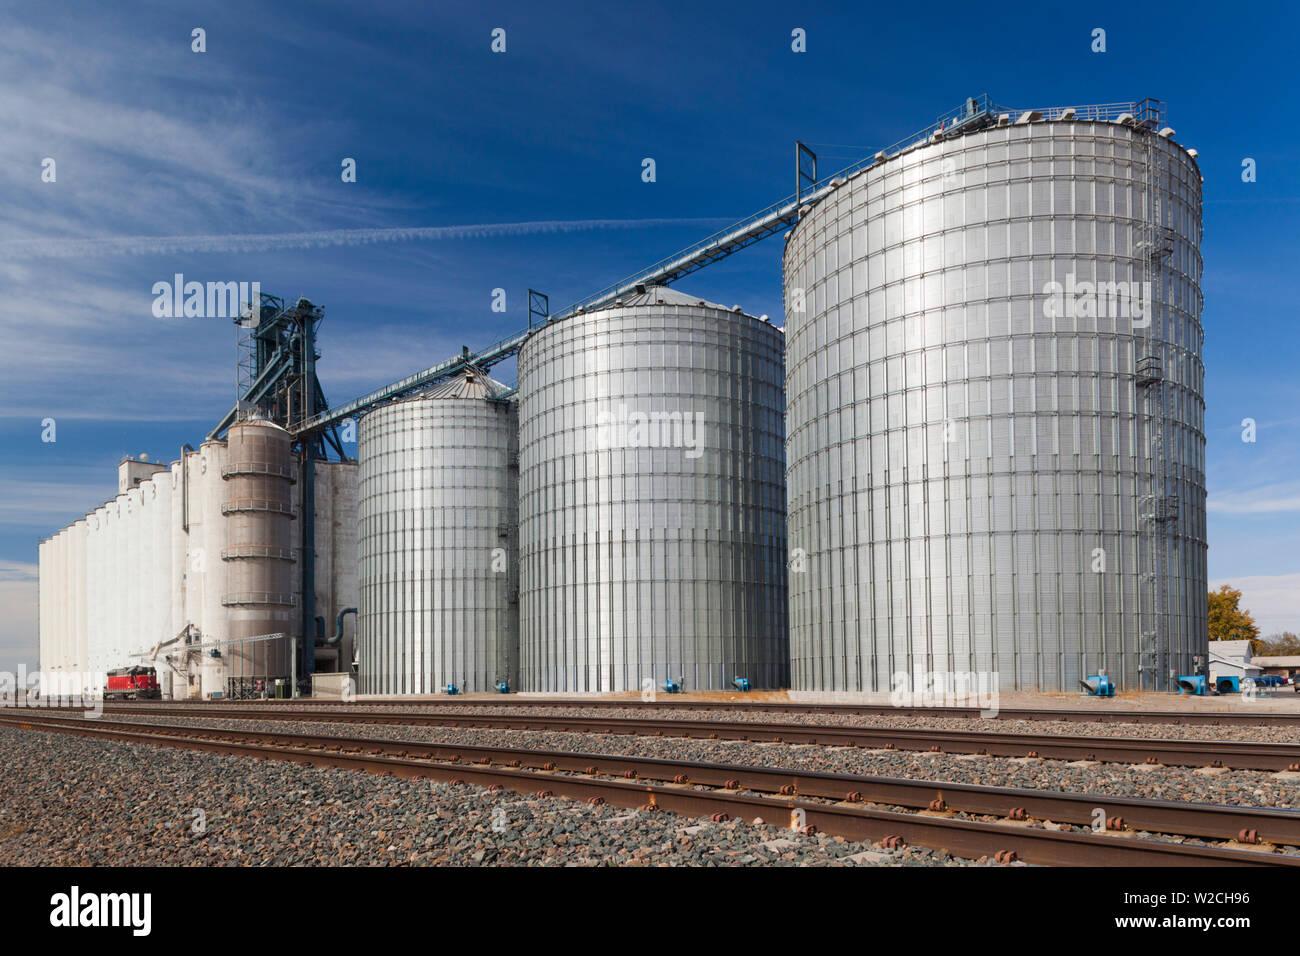 USA, Nebraska, Gothenburg, grain elevator Stock Photo